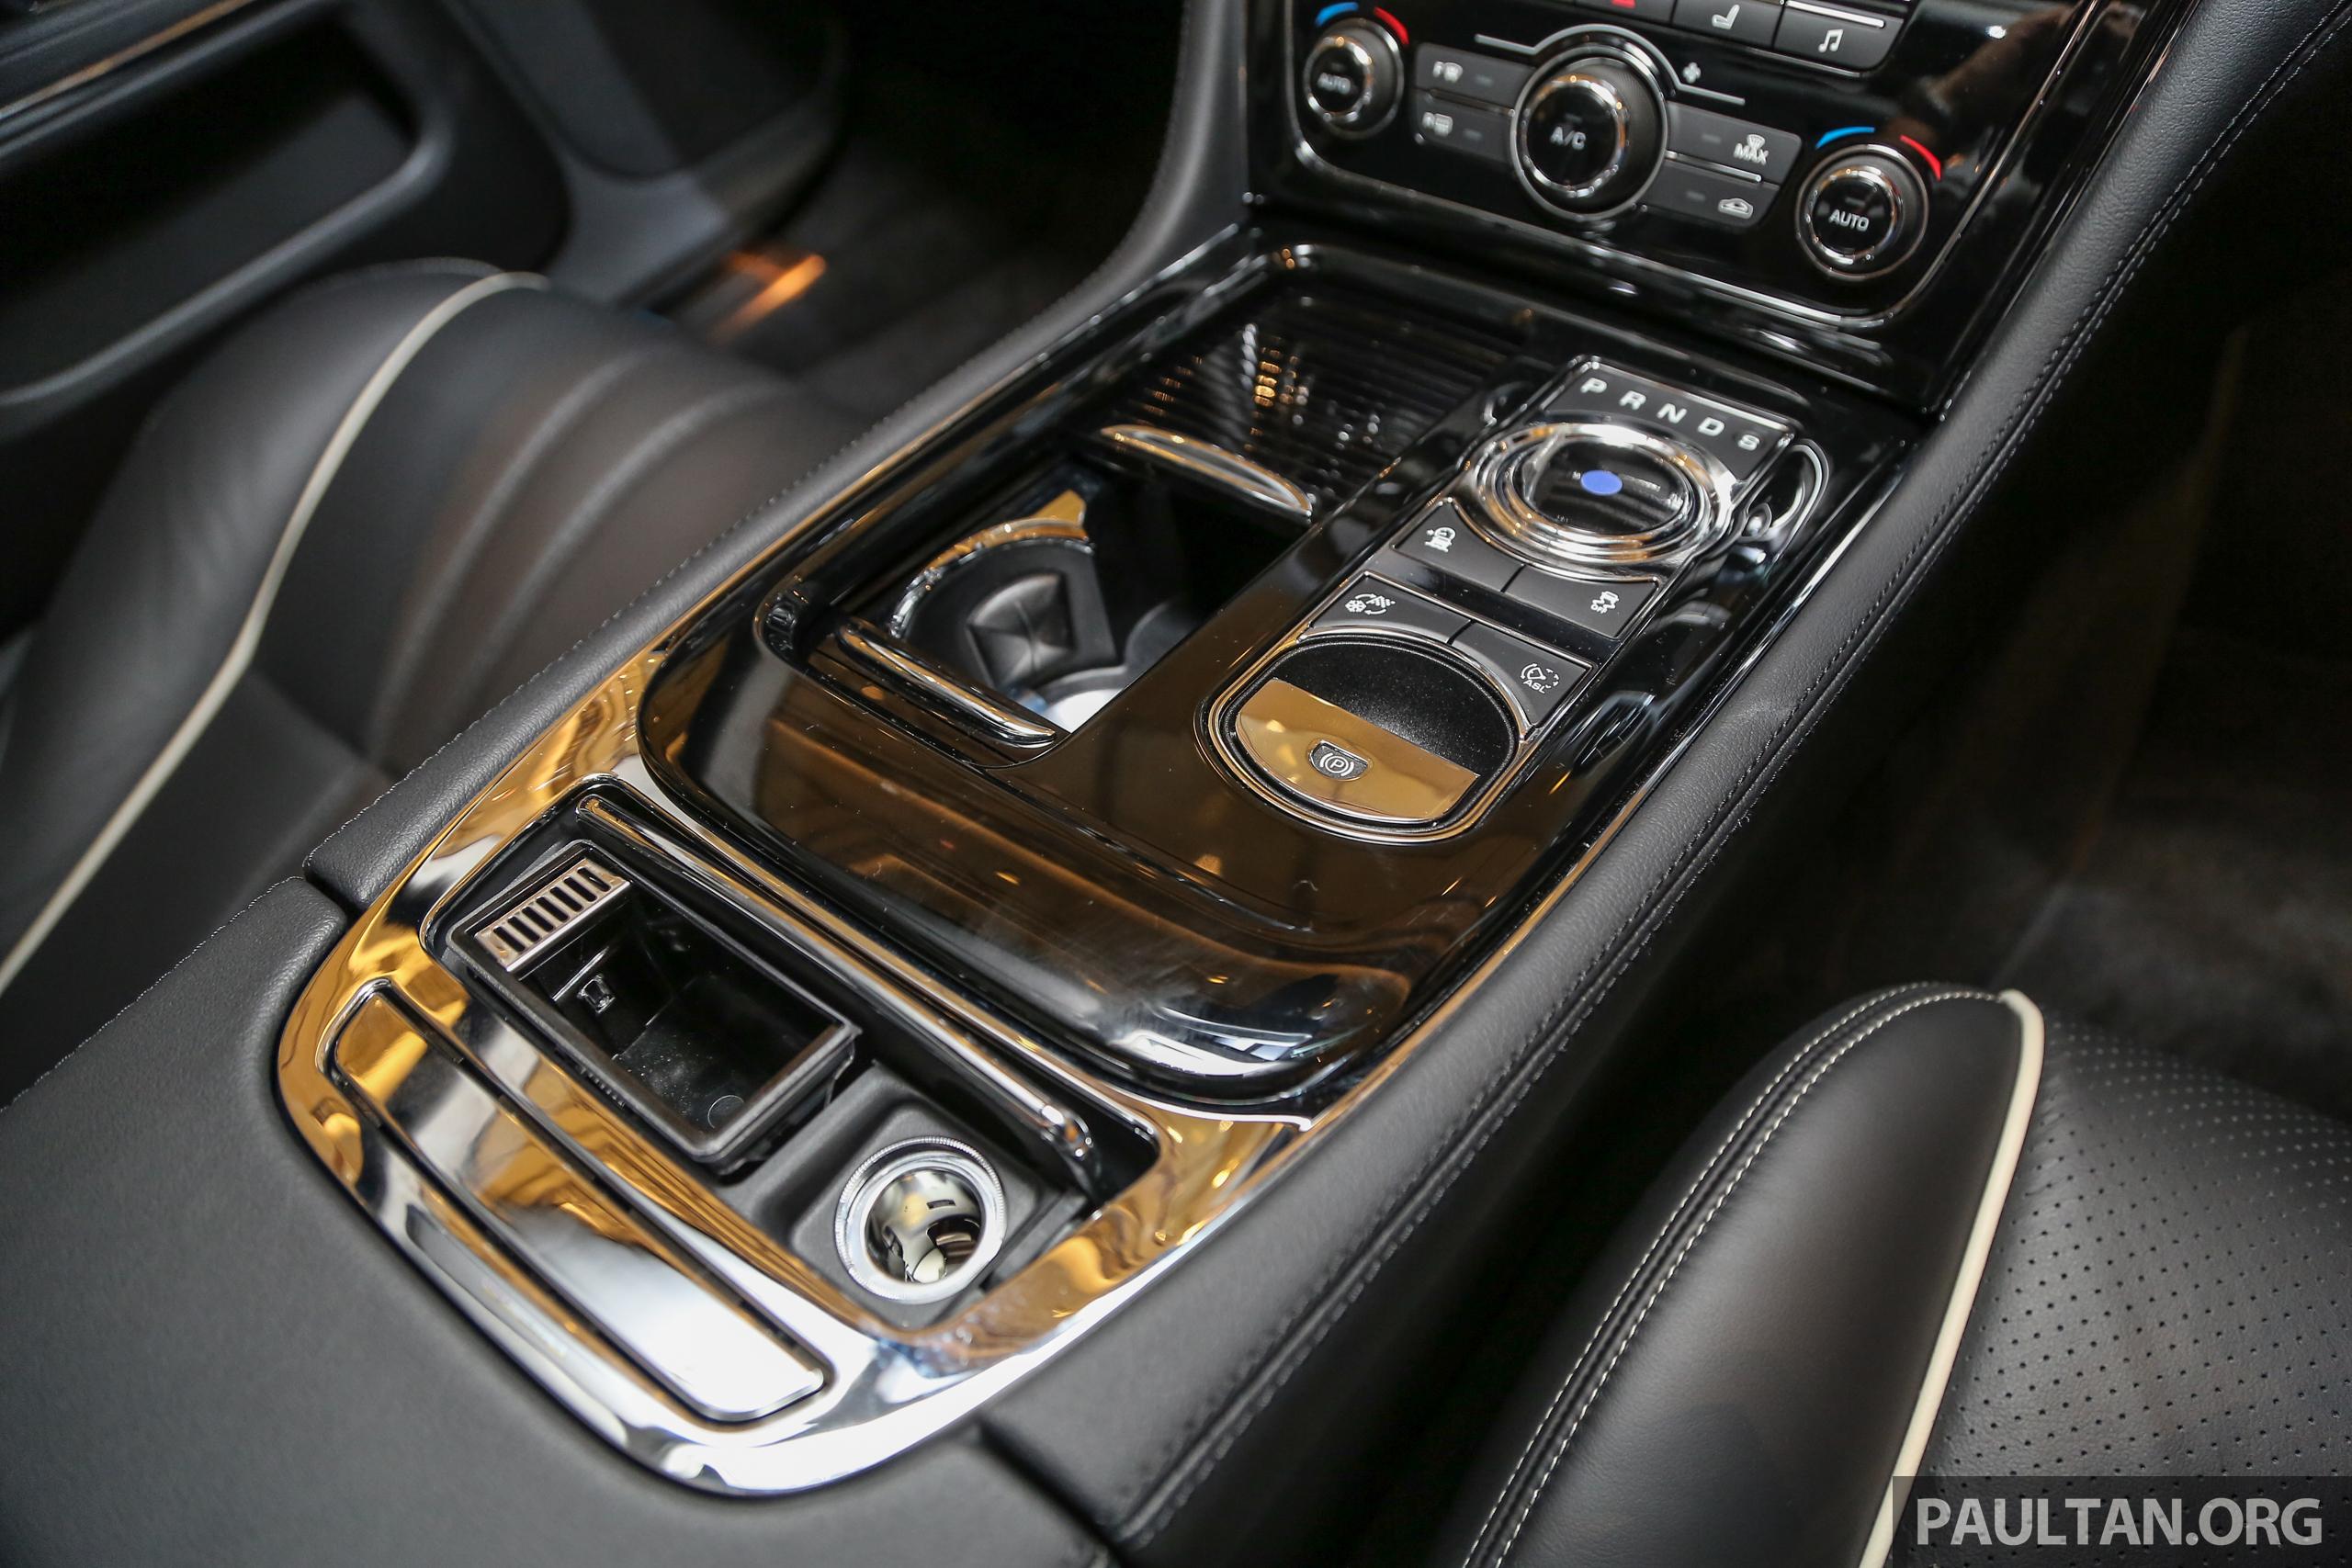 Jaguar 2018 Xj >> Jaguar XJ L 2.0 Ti facelift on display at BSC – RM703k Paul Tan - Image 499784